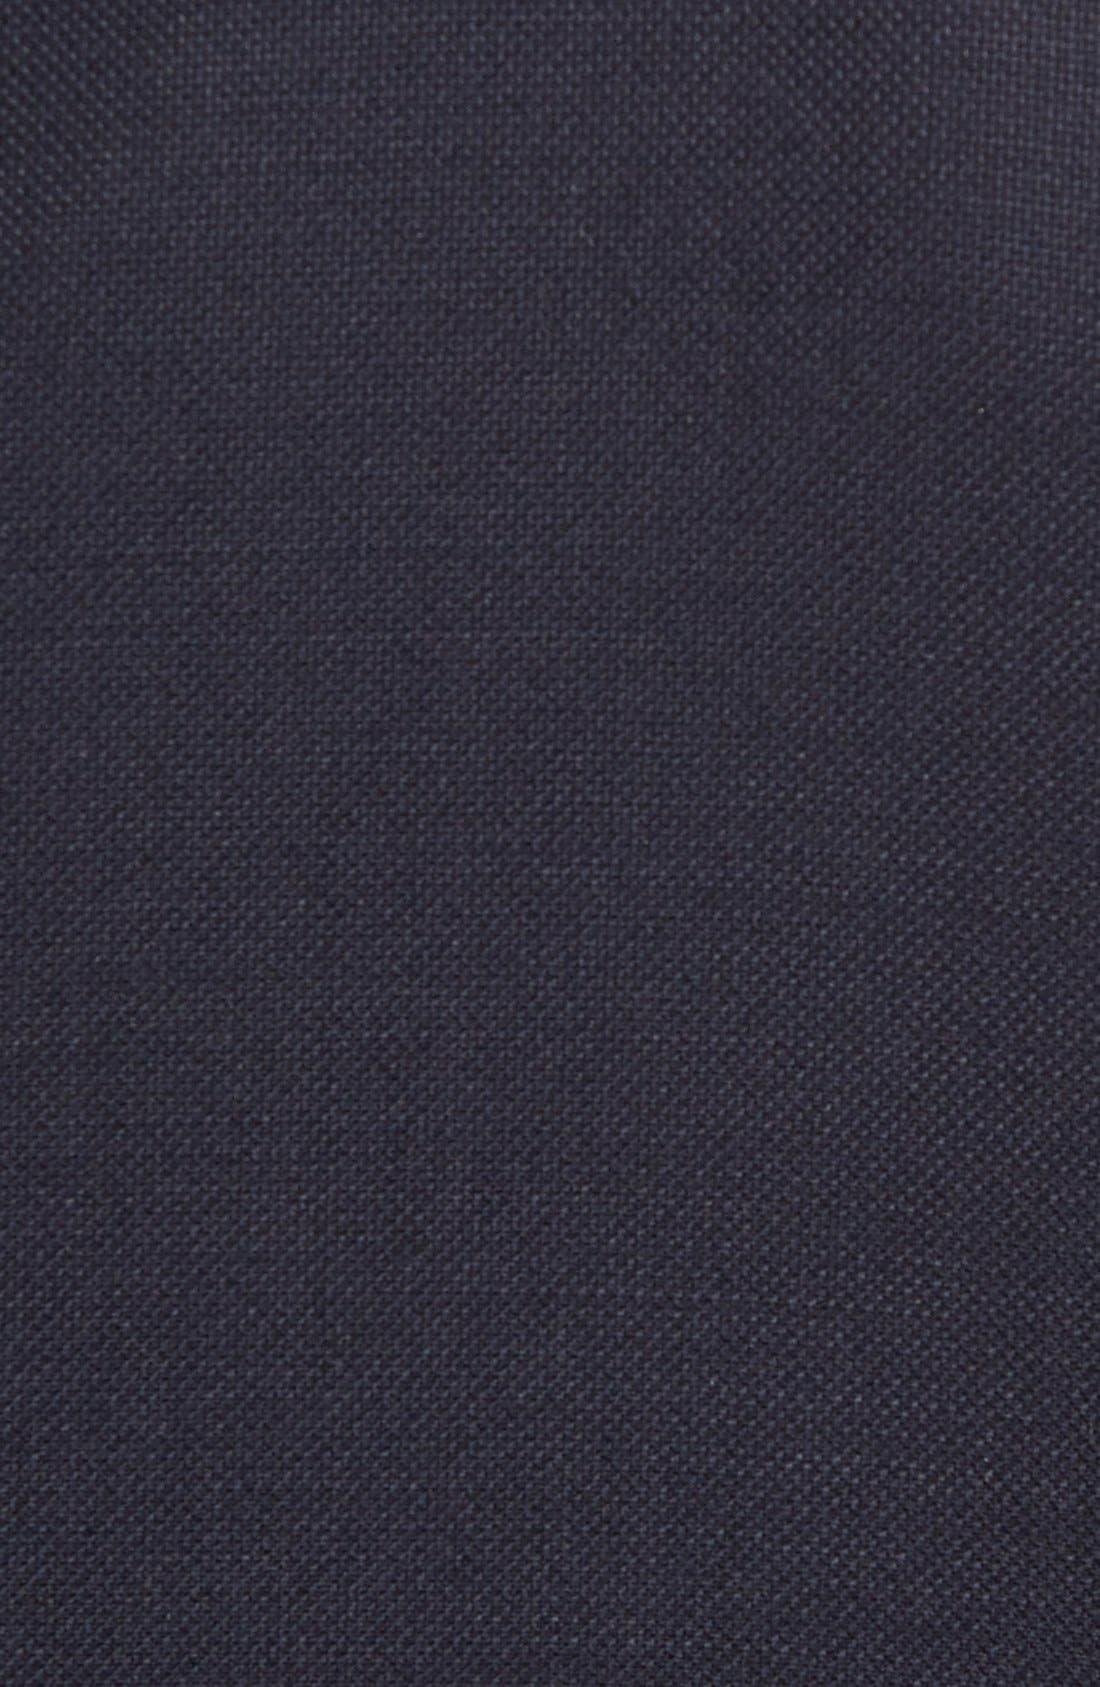 HART SCHAFFNER MARX, New York Classic Fit Wool Blend Blazer, Alternate thumbnail 11, color, NAVY